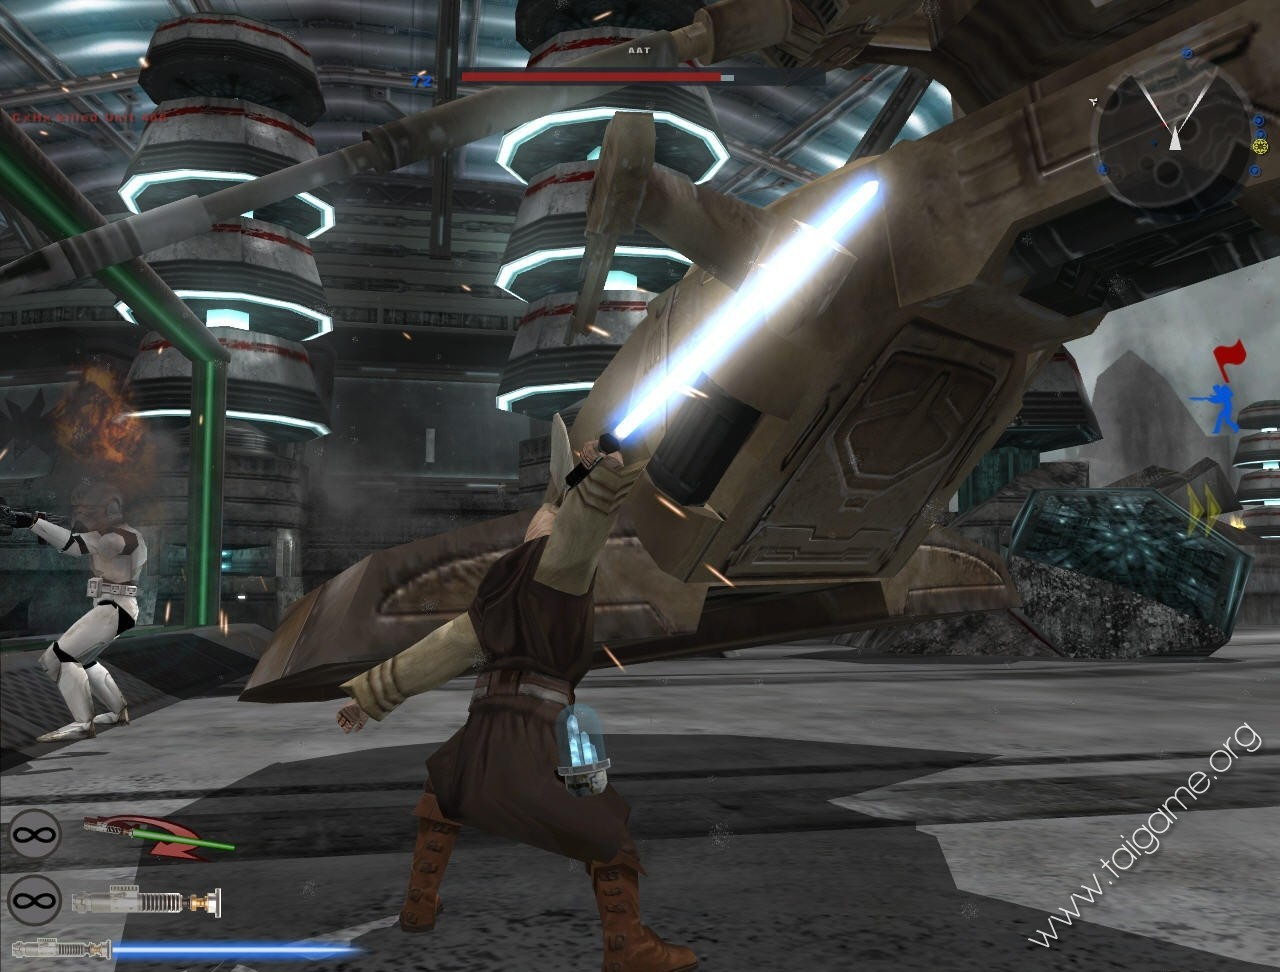 Star Wars Battlefront Ii Download Free Full Games Arcade Amp Action Games